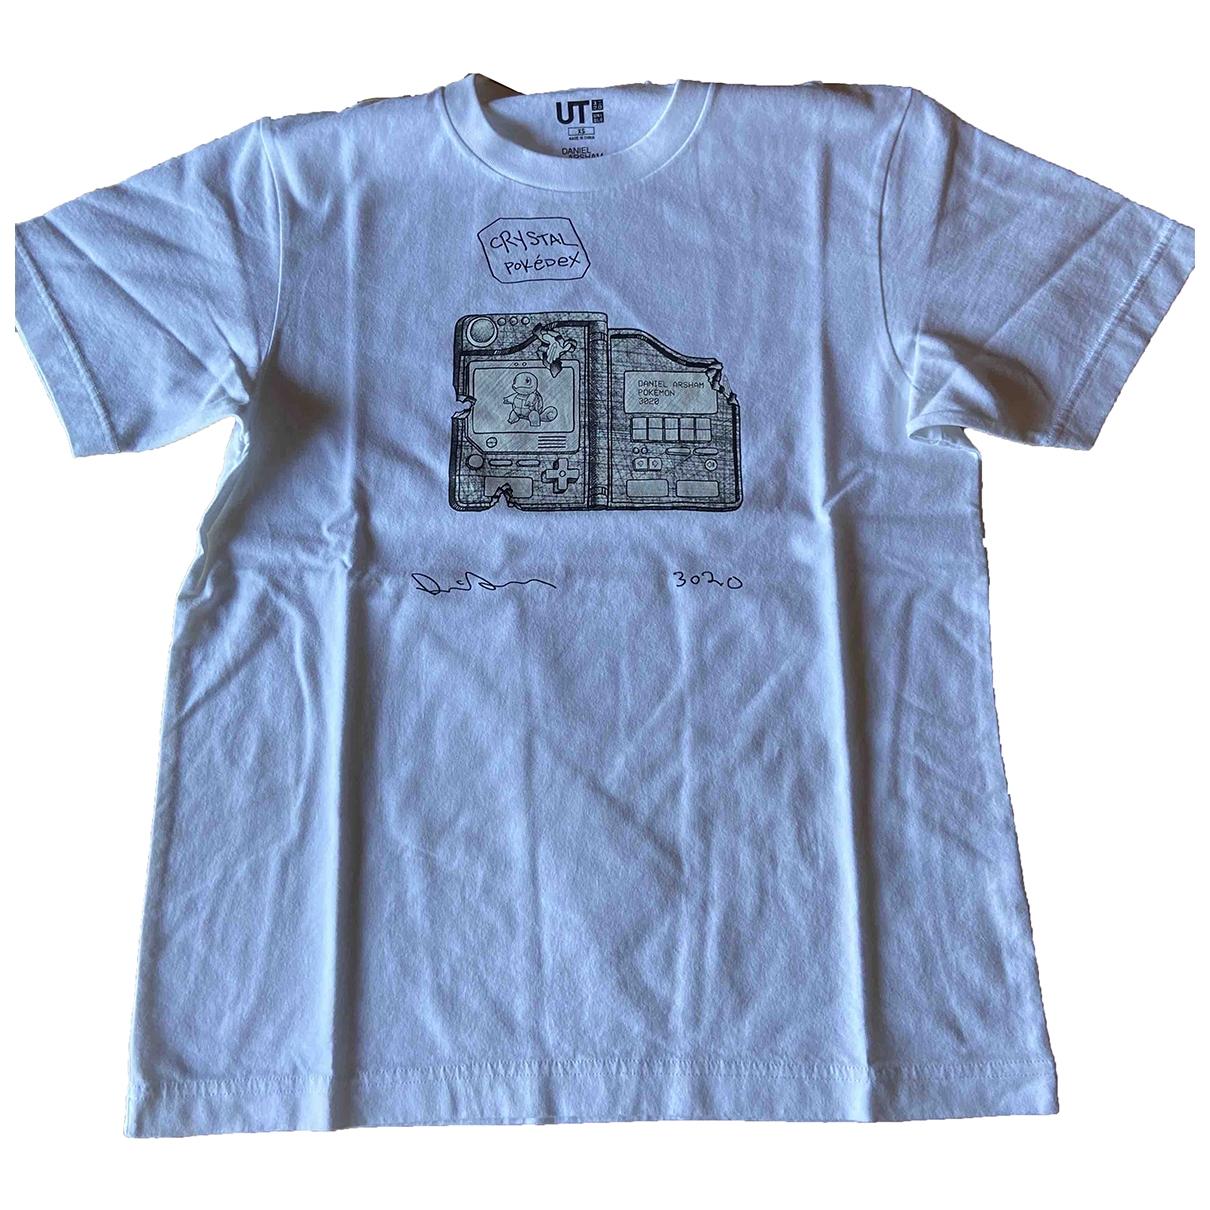 Uniqlo \N White Cotton T-shirts for Men XS International